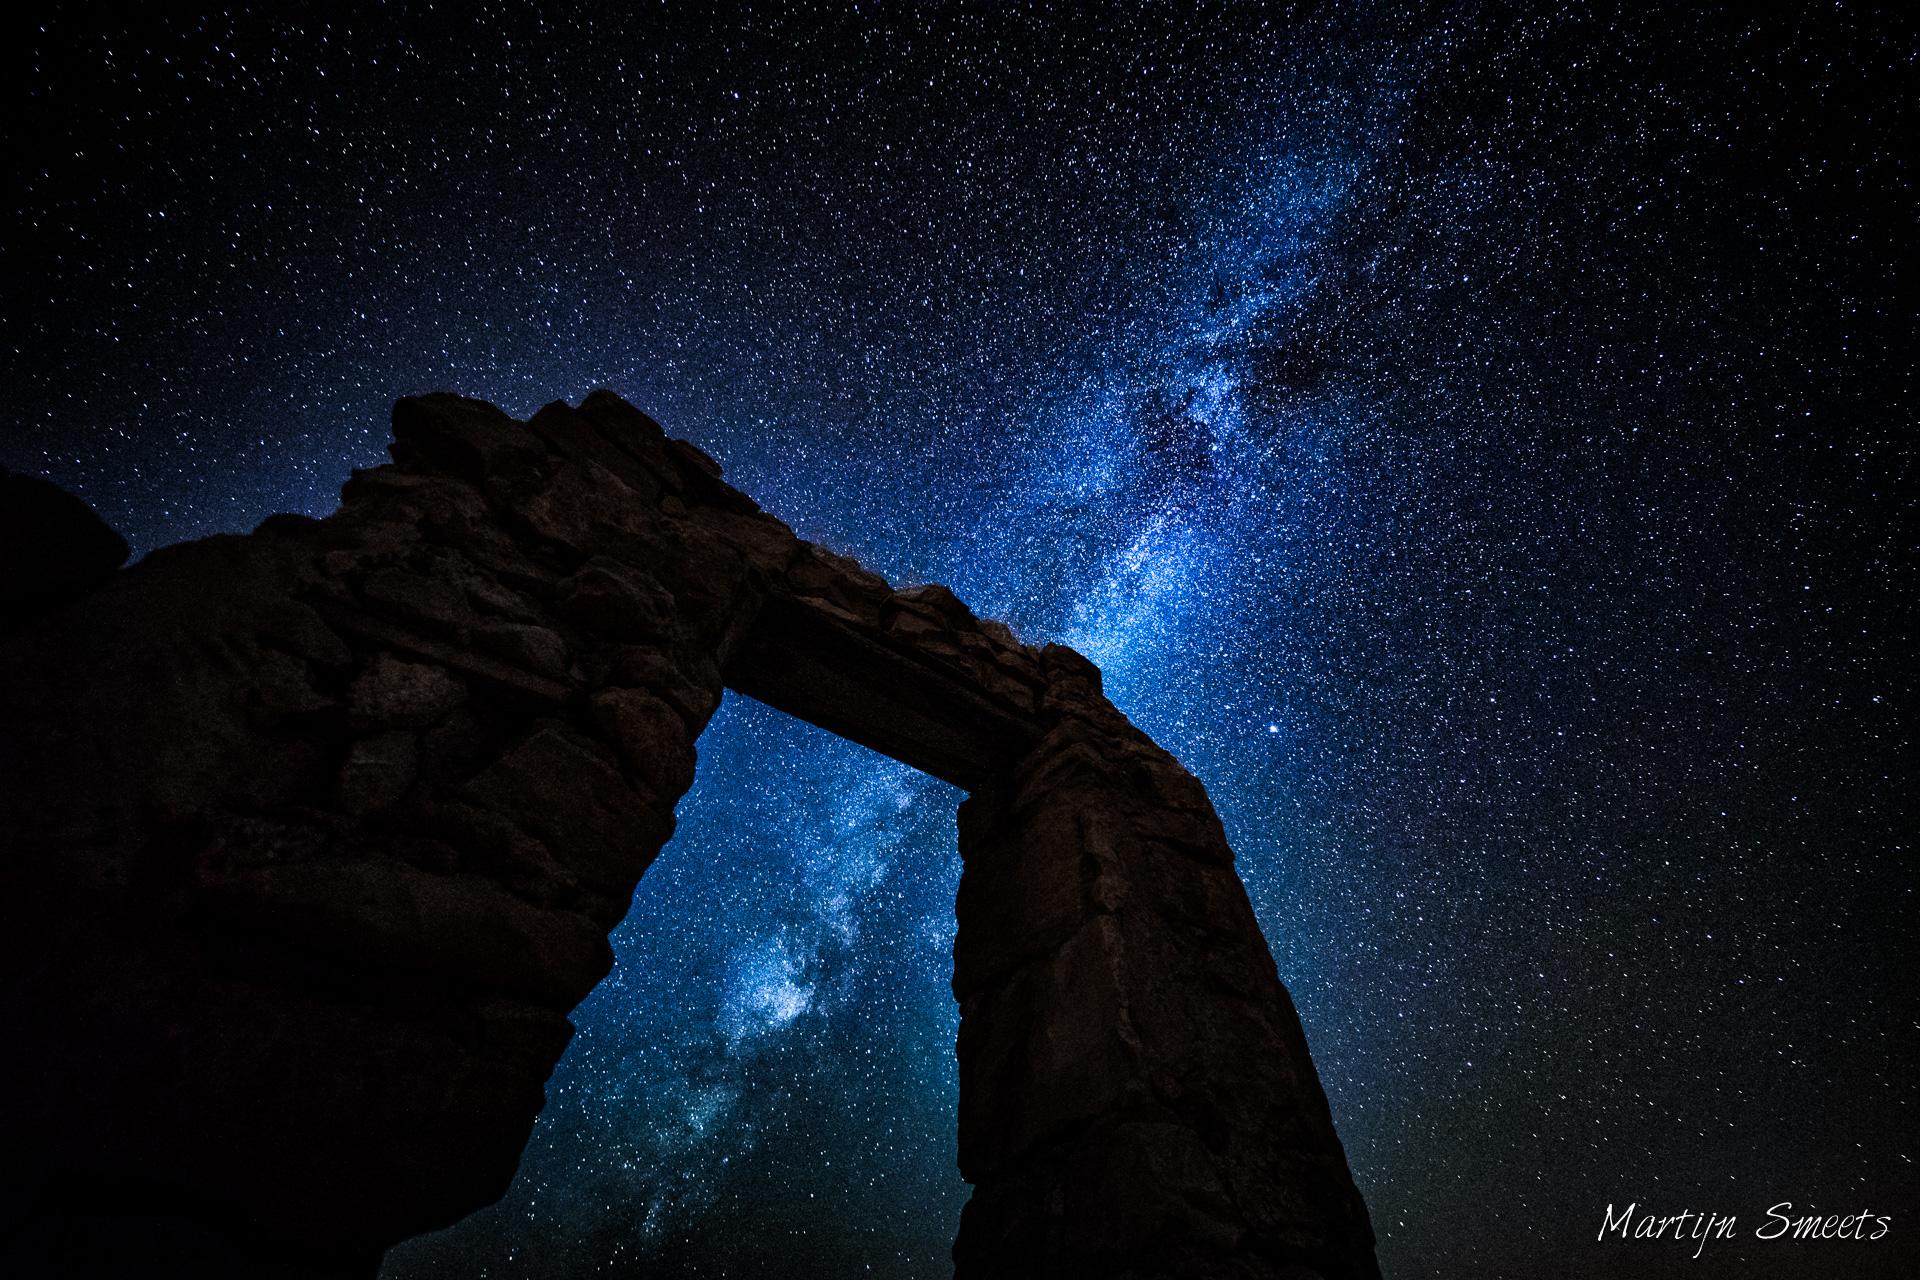 Nachtfotografie: de Melkweg boven Dana, Jordanië